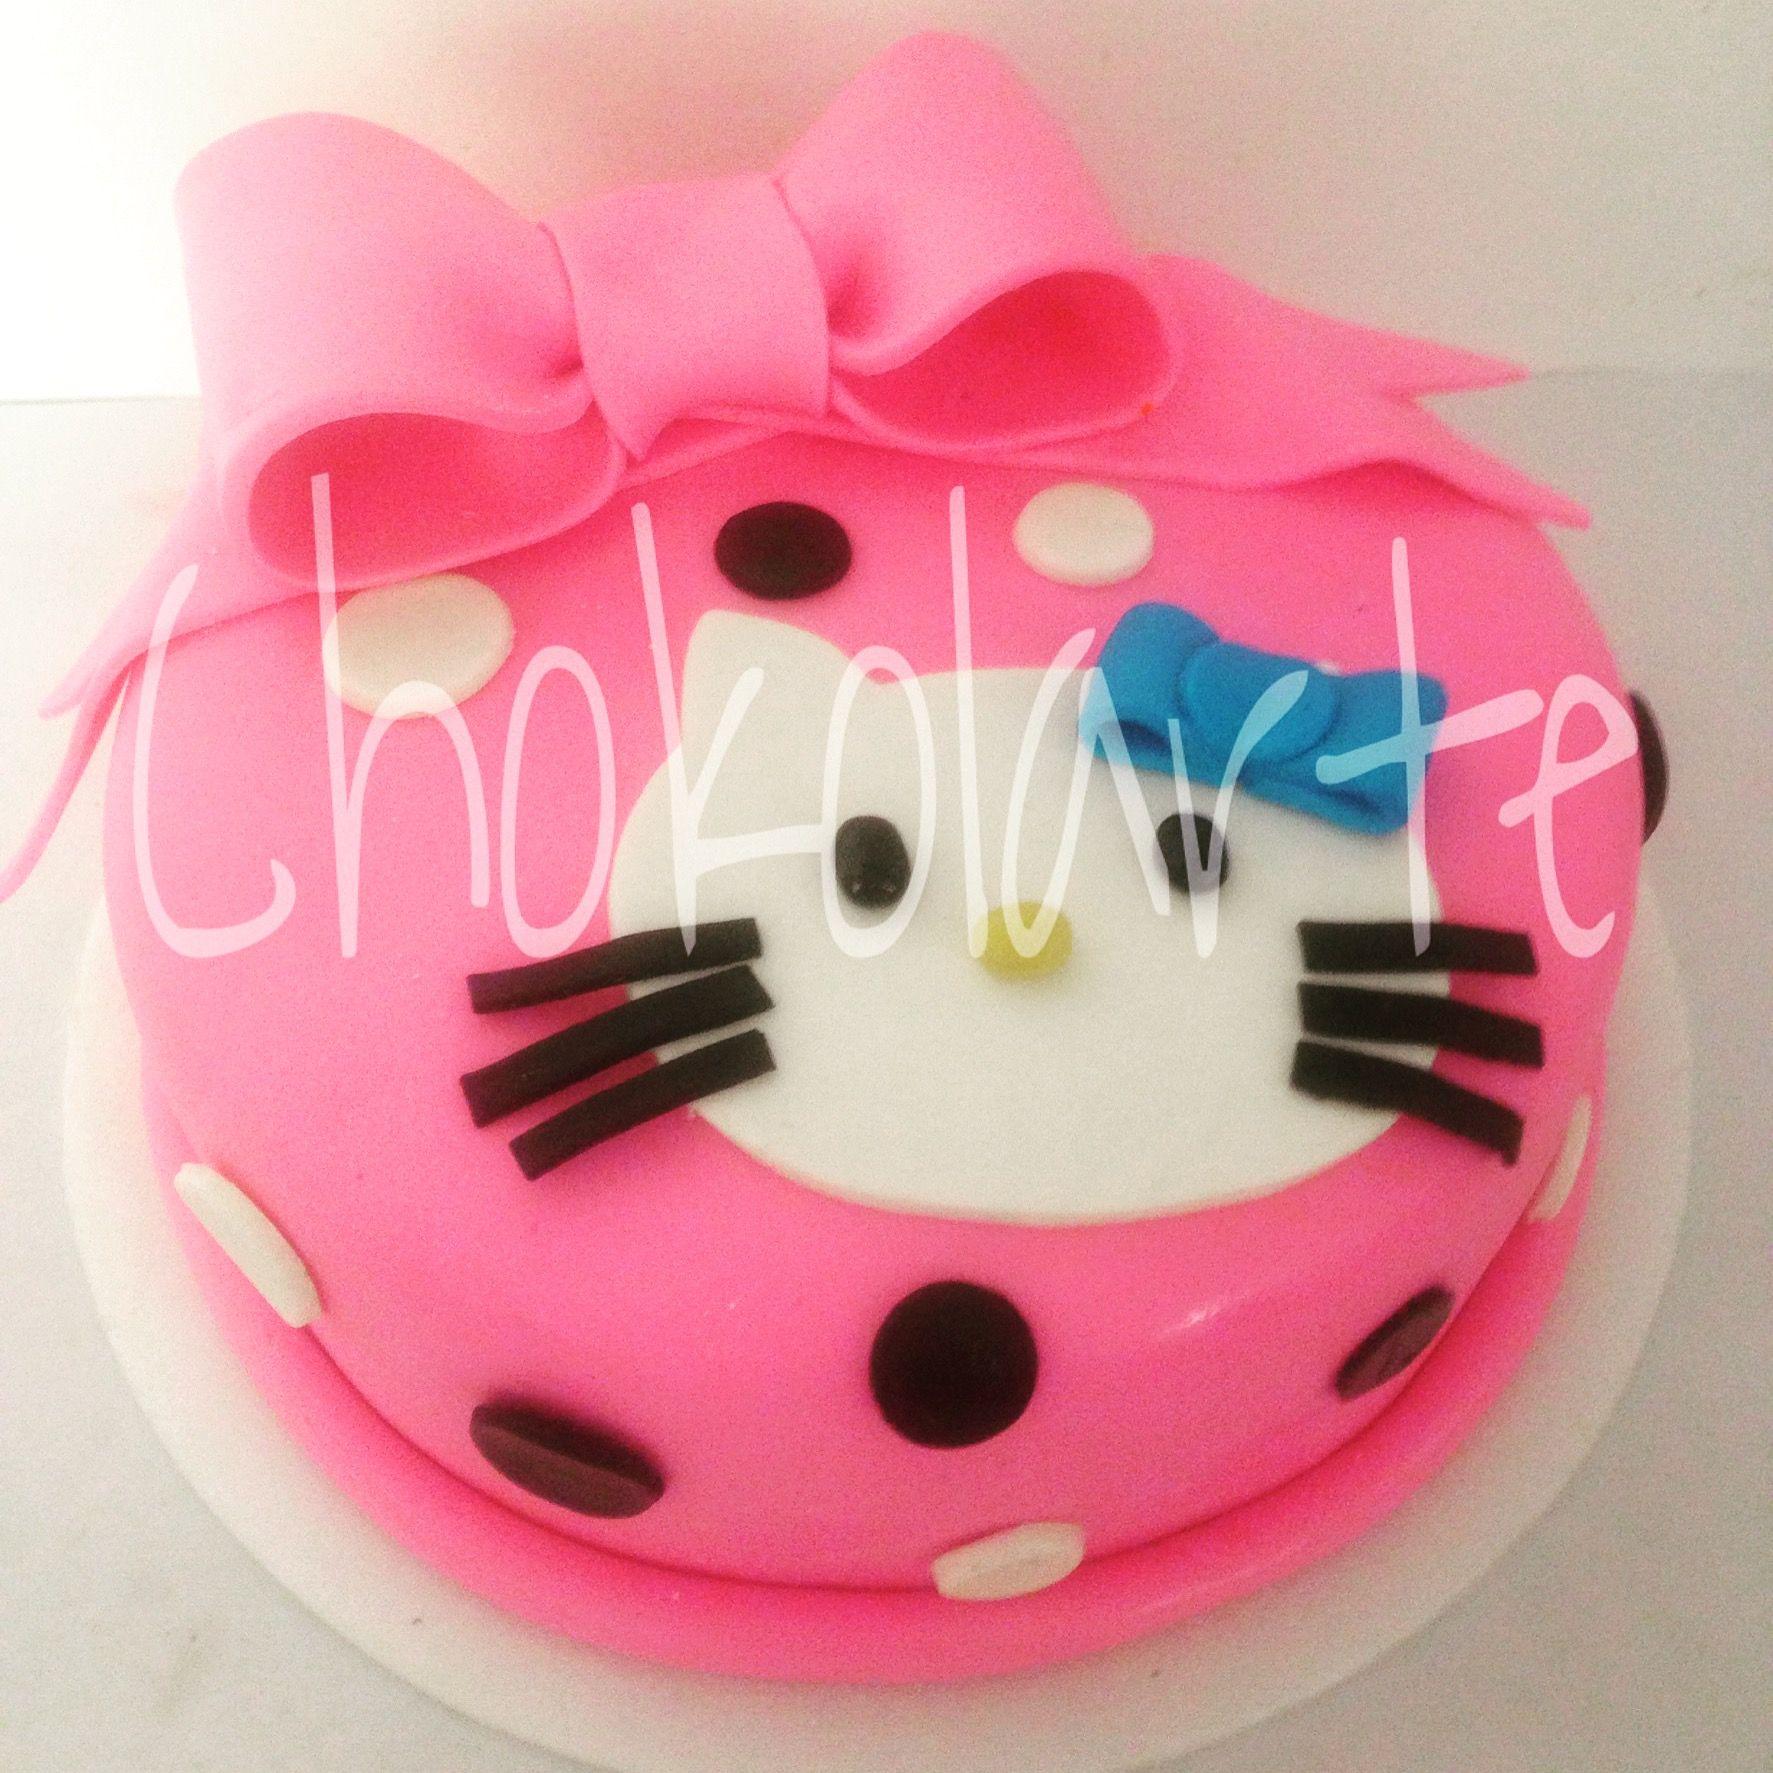 Torta Hello Kitty  Pedidos 318-502-2822  Cali Colombia